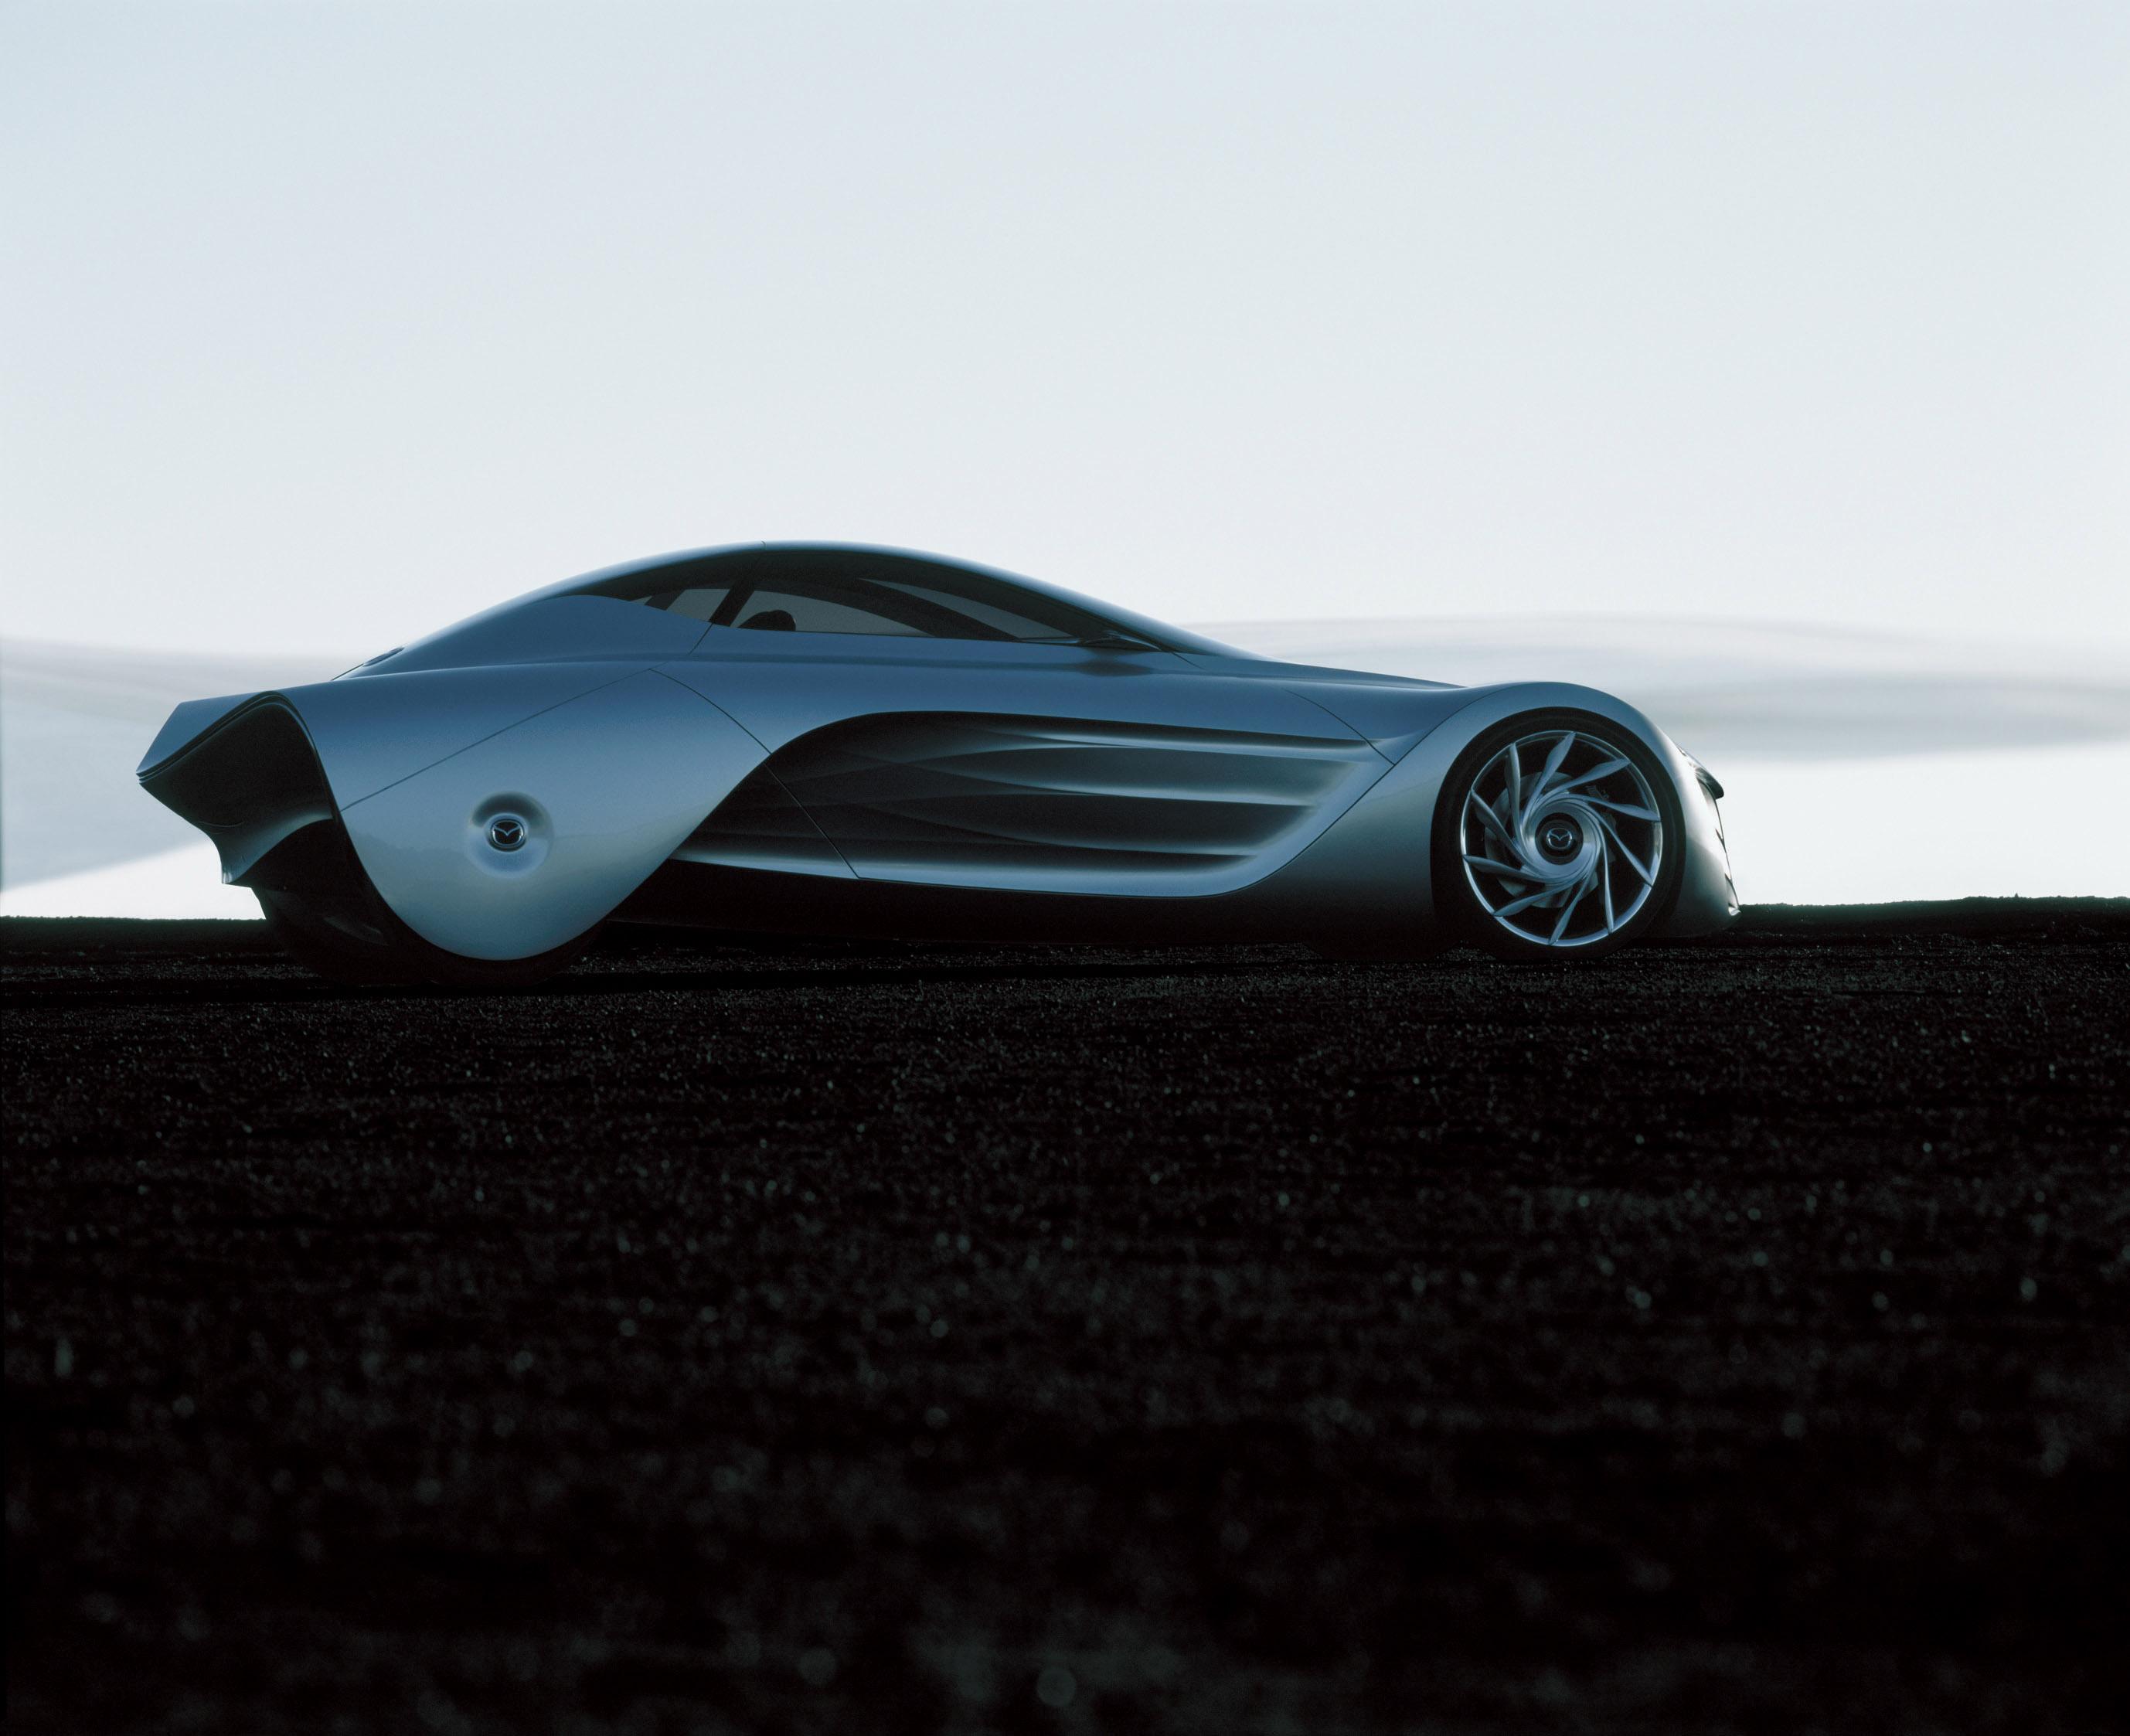 https://www.automobilesreview.com/gallery/mazda-taiki-concept/mazda-taiki-concept-05.jpg